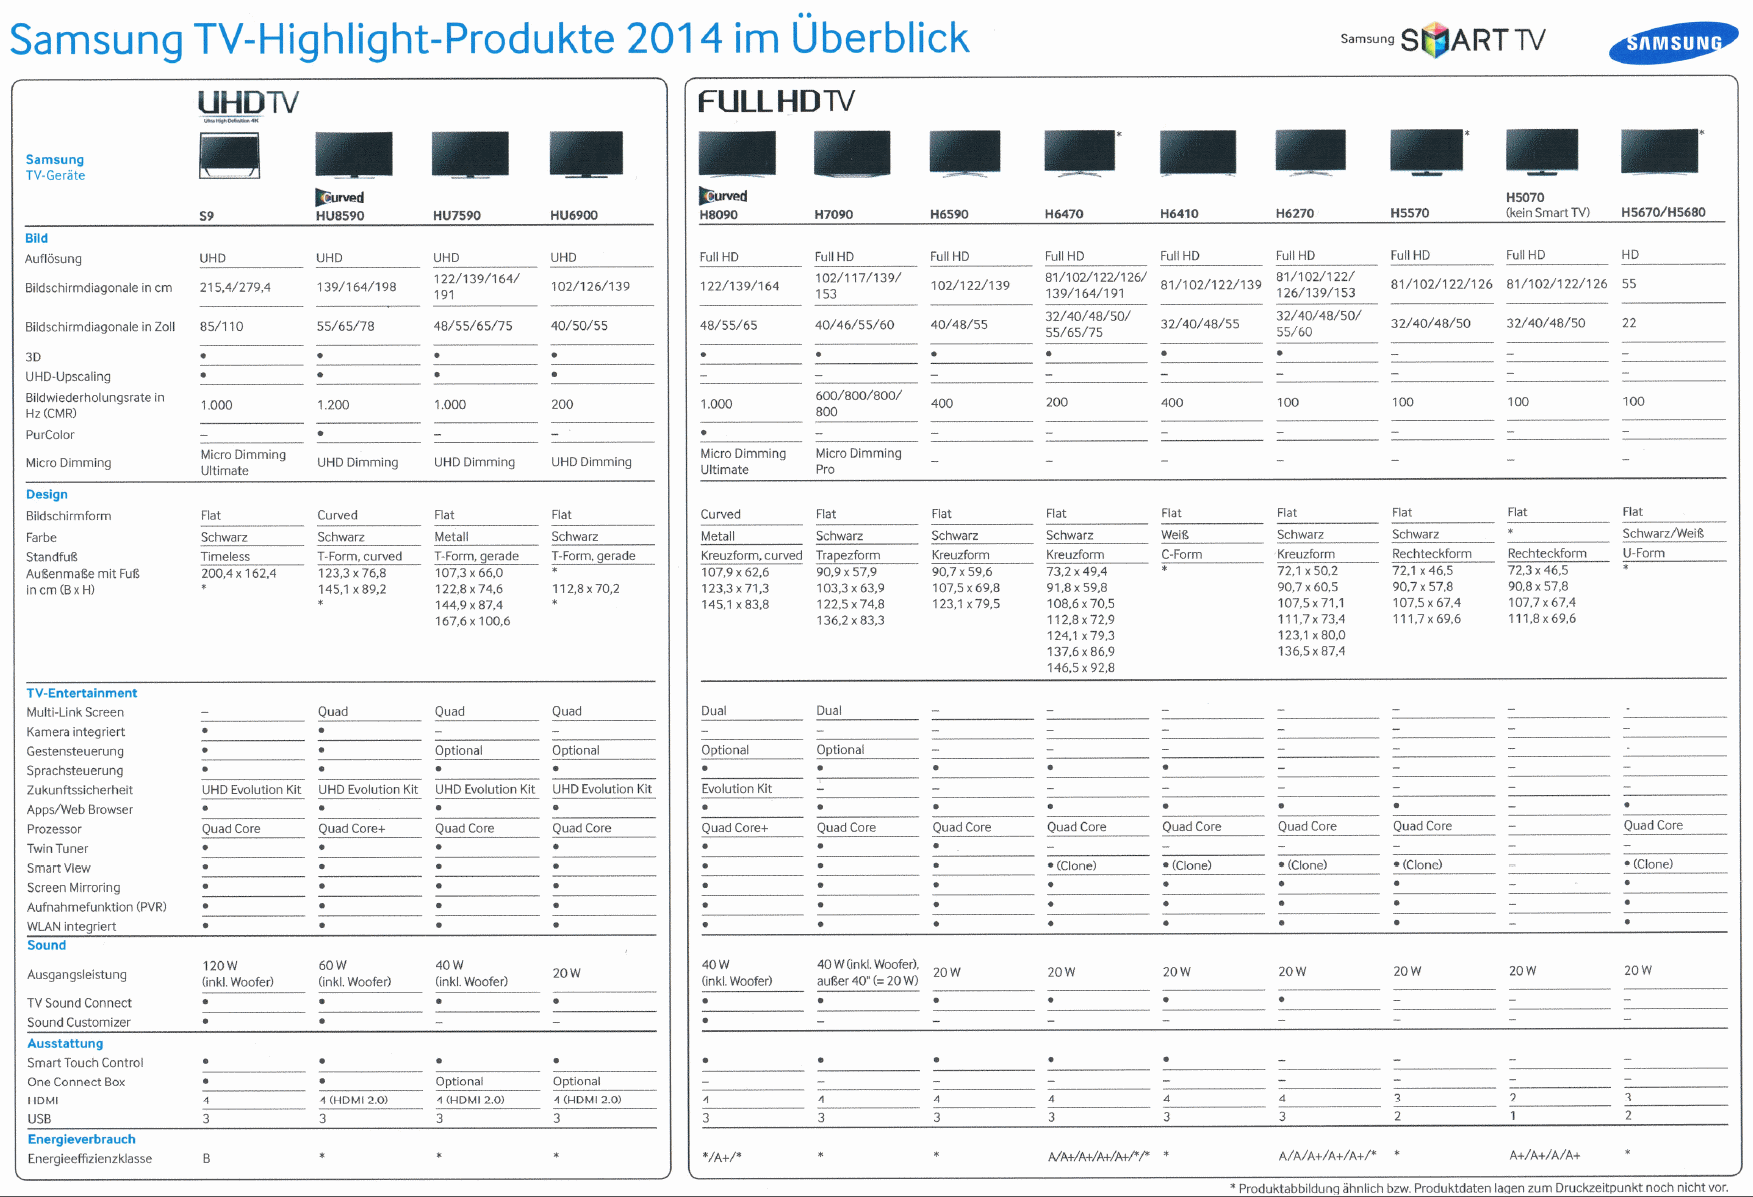 Samsung H-Serie Lineup